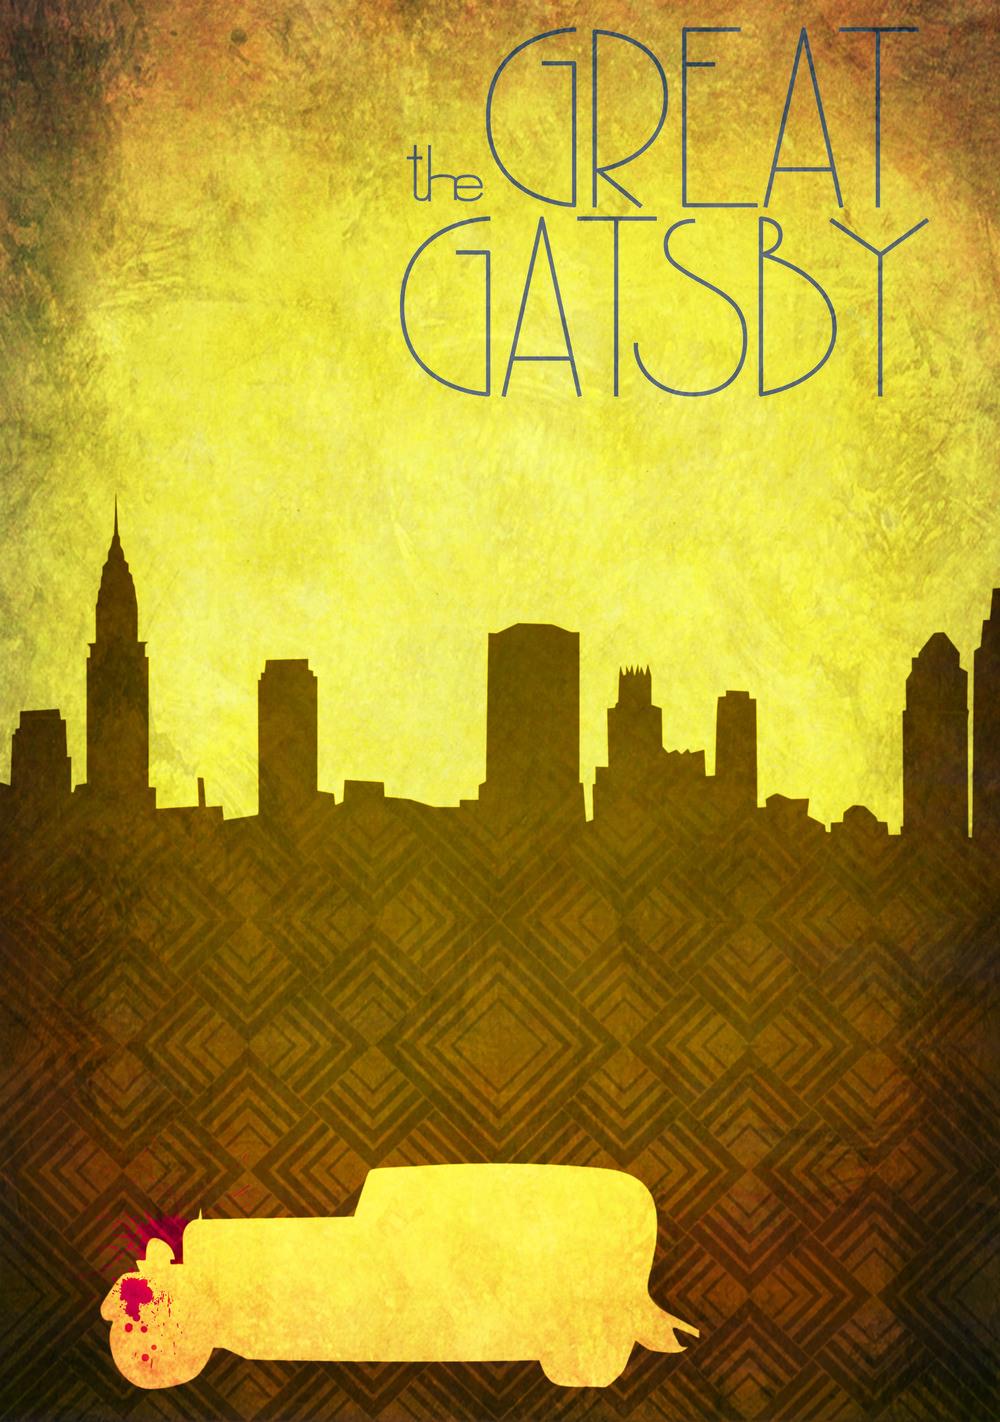 Gatsbyprint.jpg